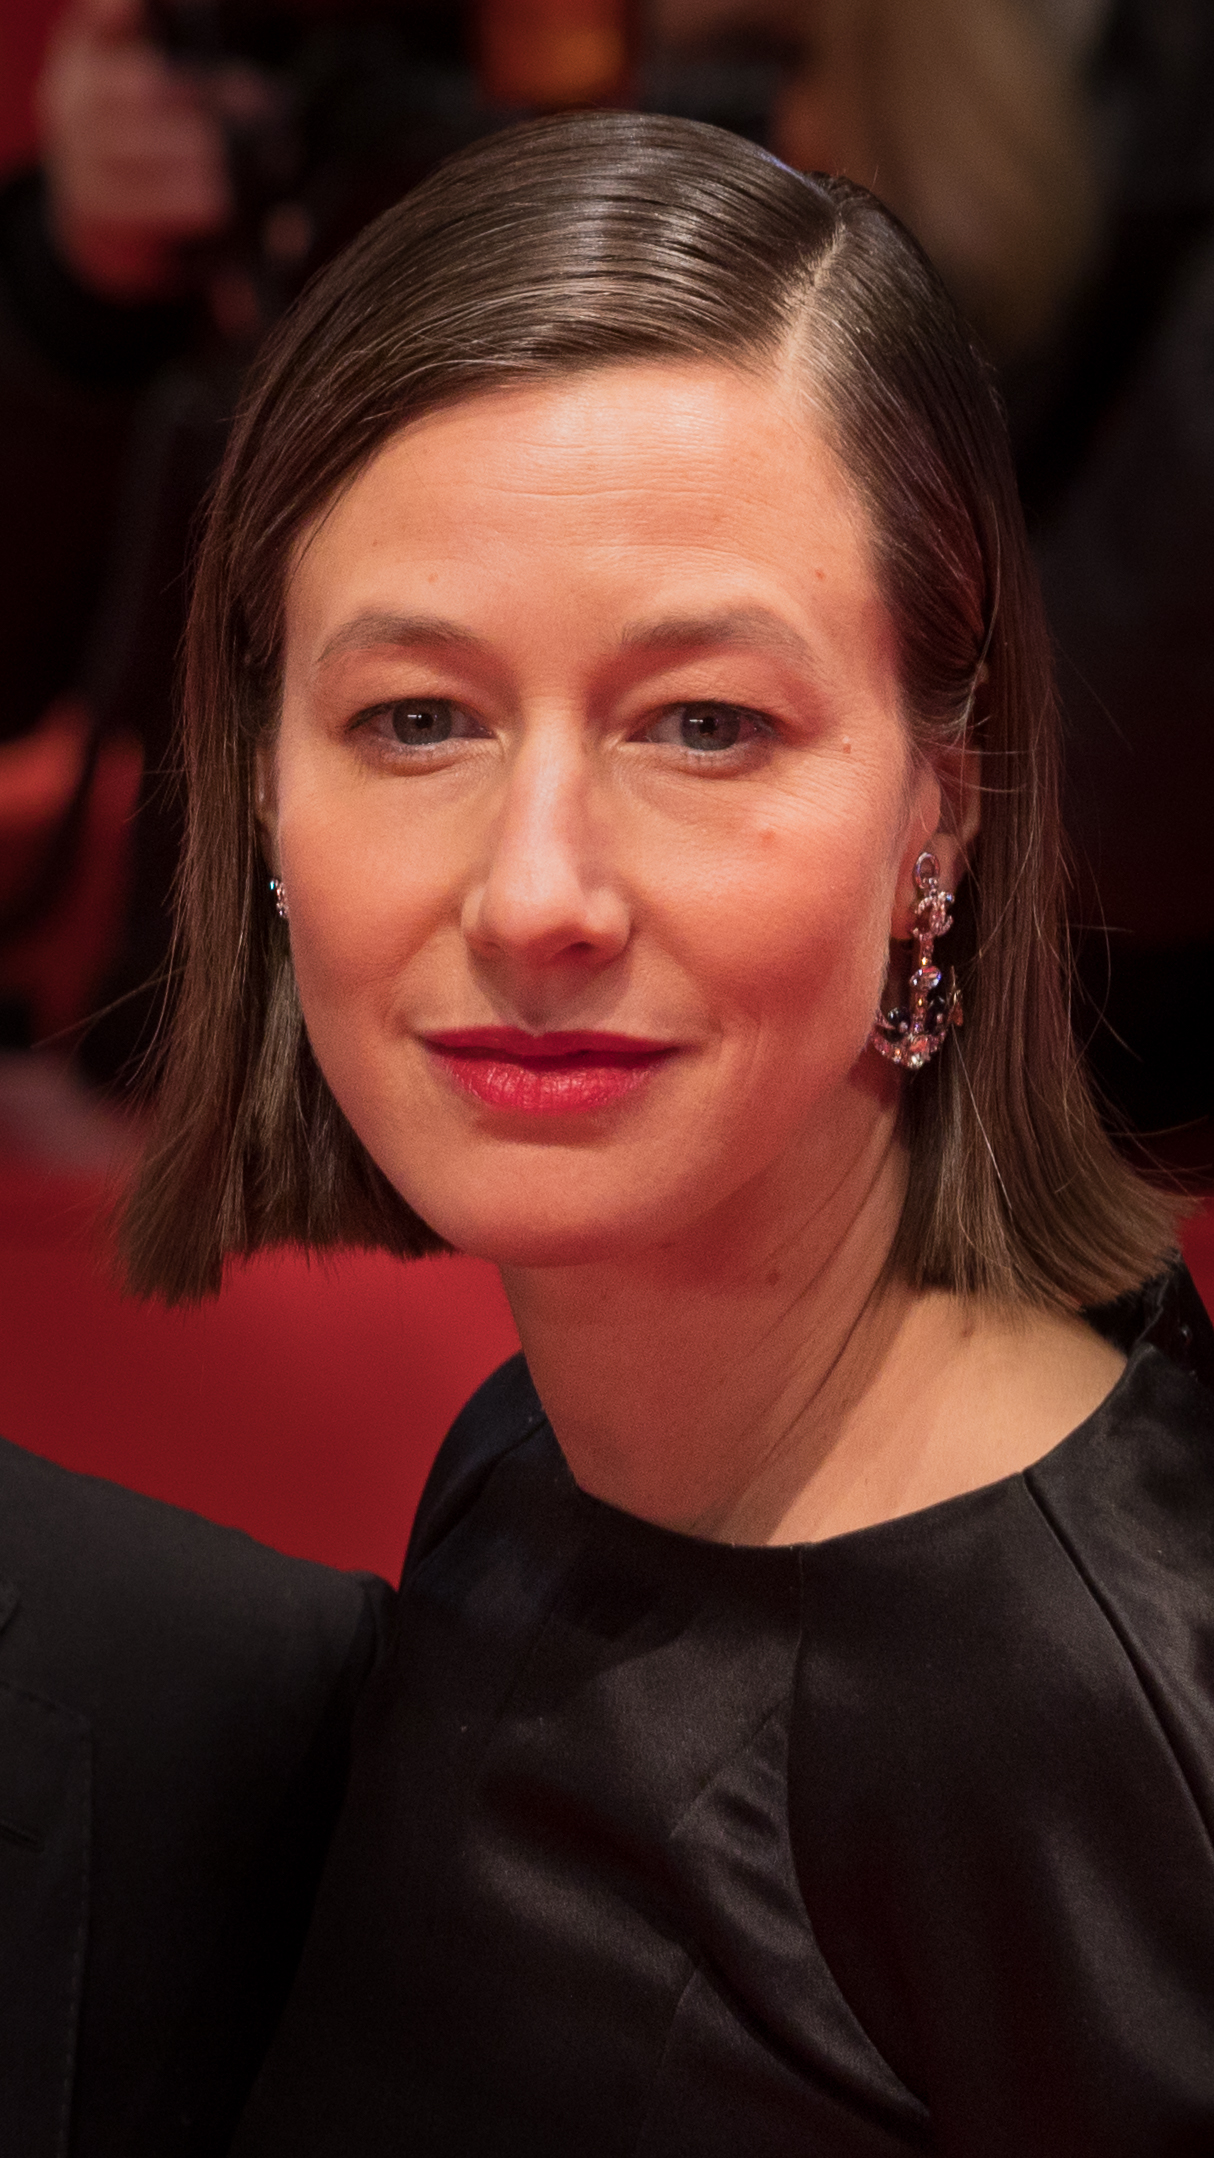 File:MJK 08168 Johanna Wokalek (Berlinale 2018).jpg